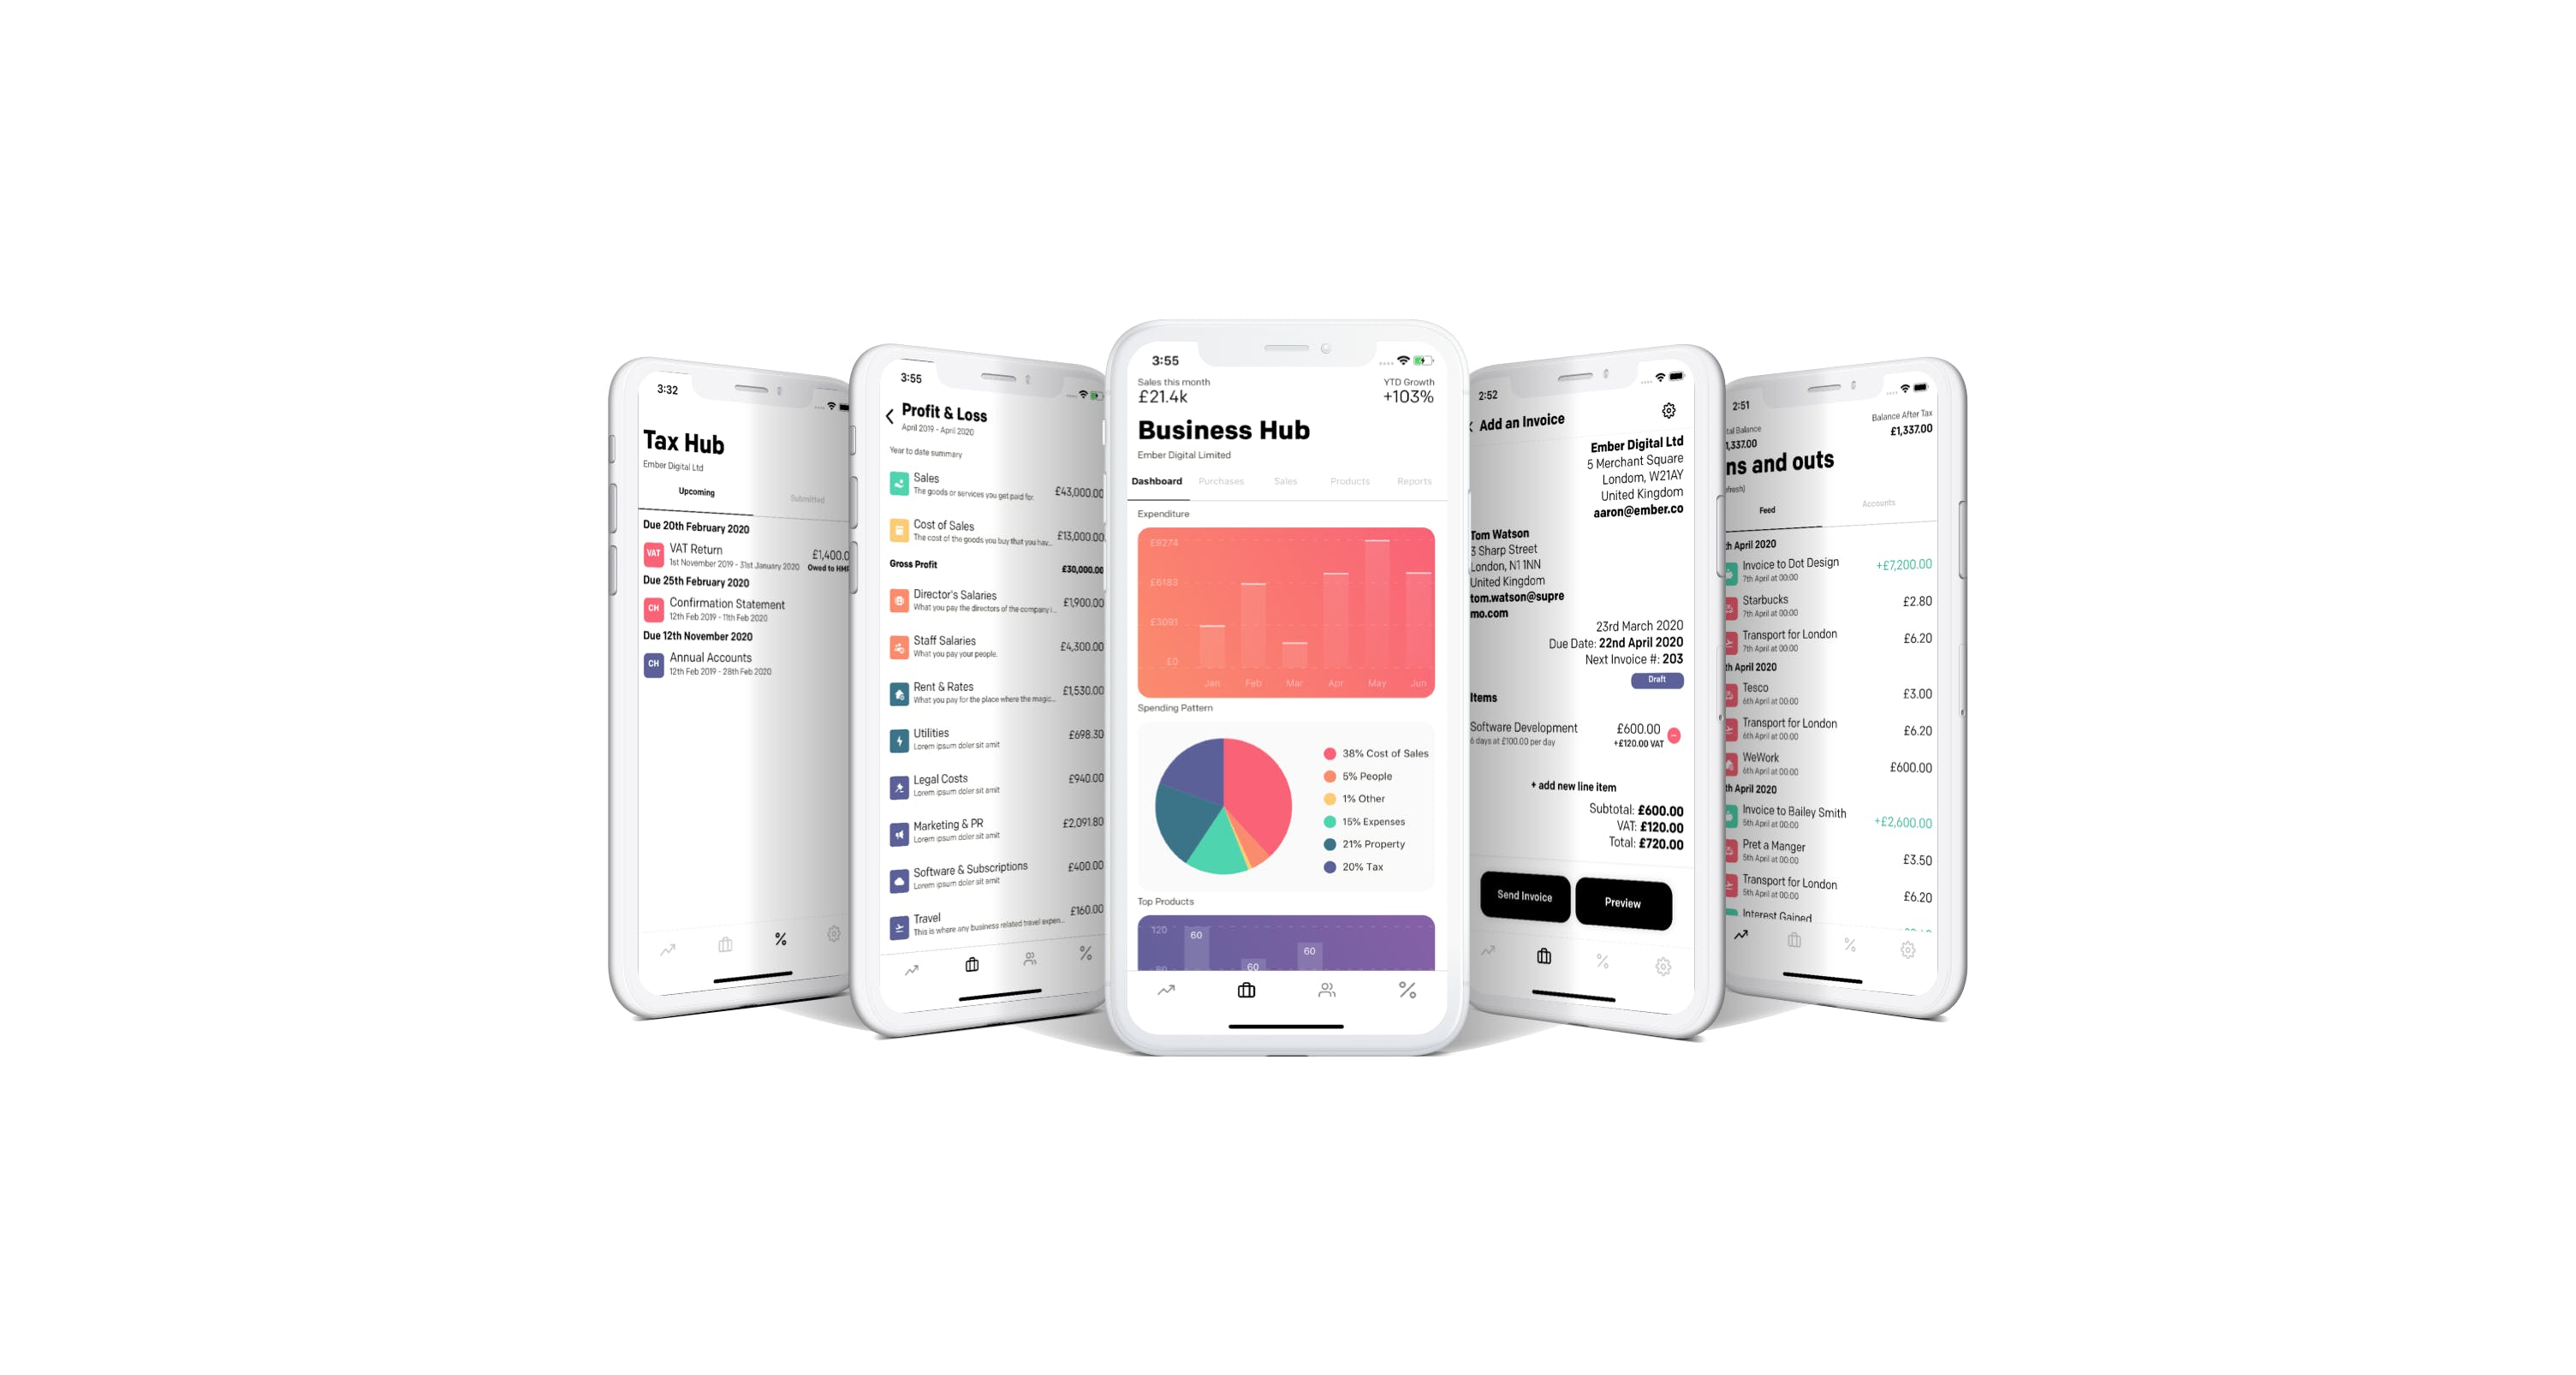 5 phones with screenshots of the app